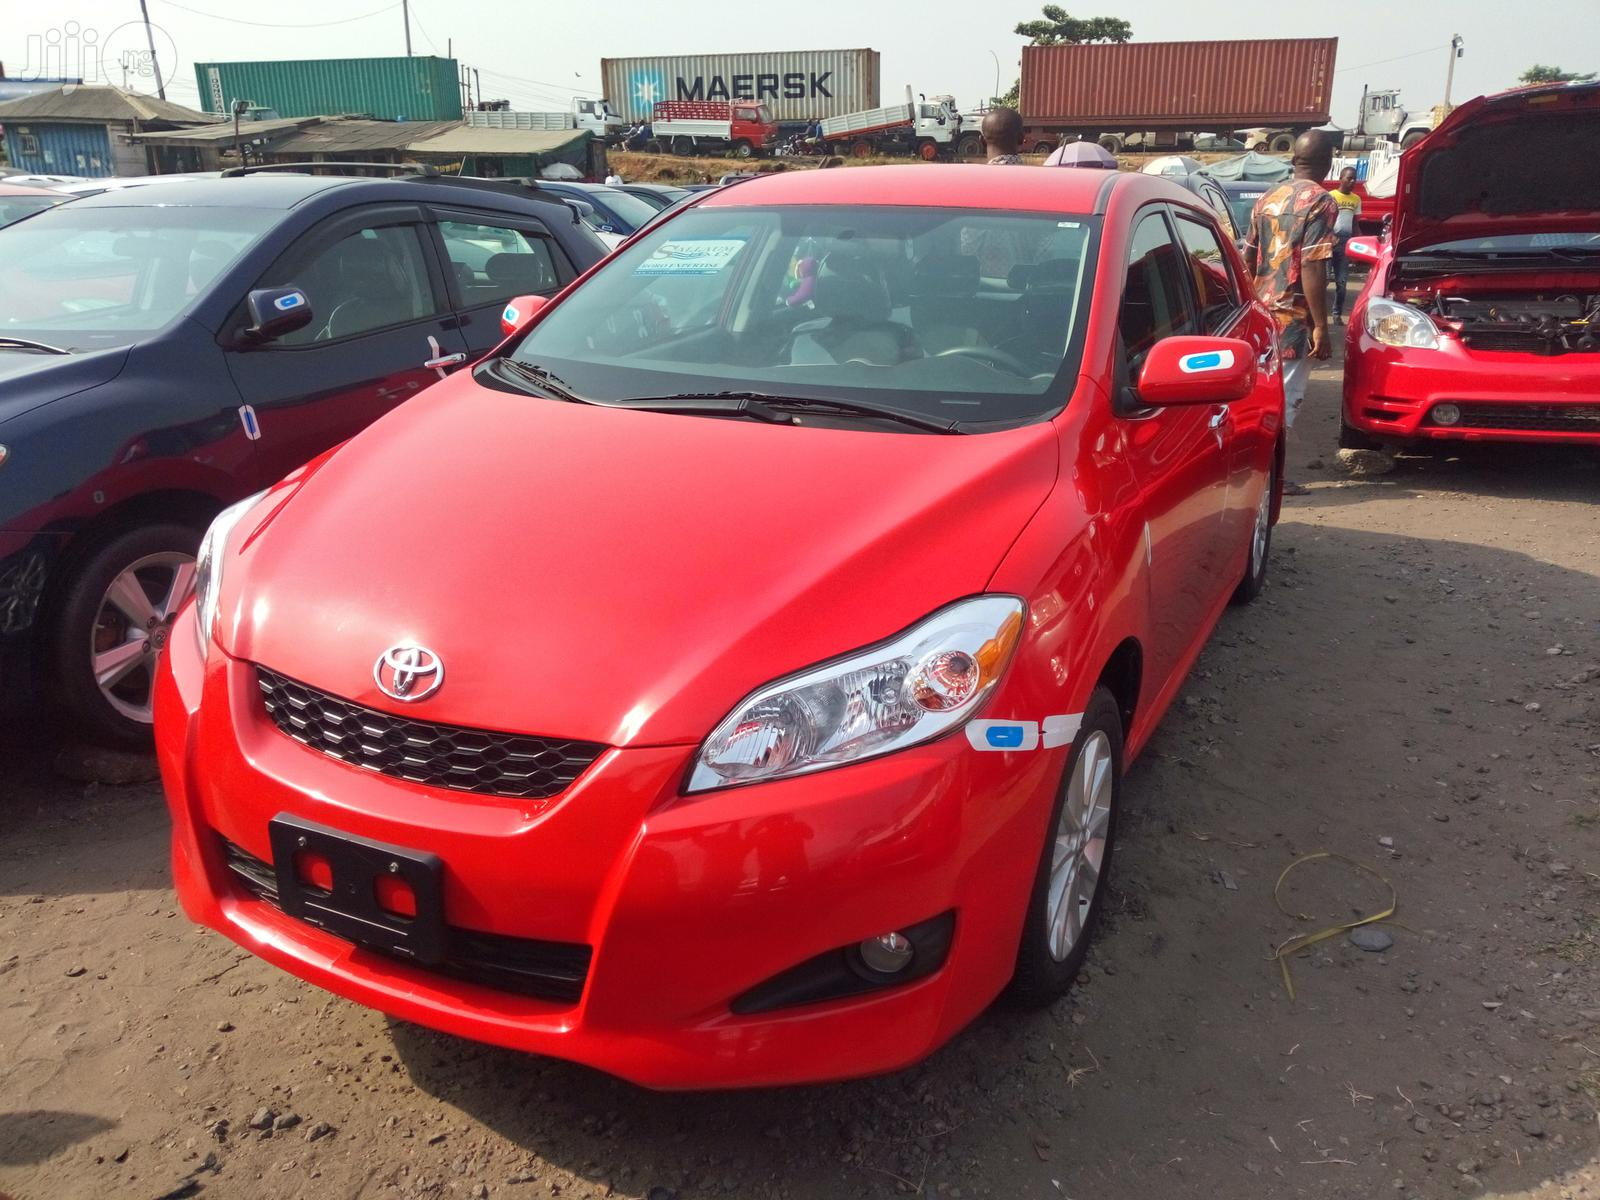 Toyota Matrix 2010 Red In Apapa Cars Prince Cosmos Jiji Ng For Sale In Apapa Prince Cosmos On Jiji Ng